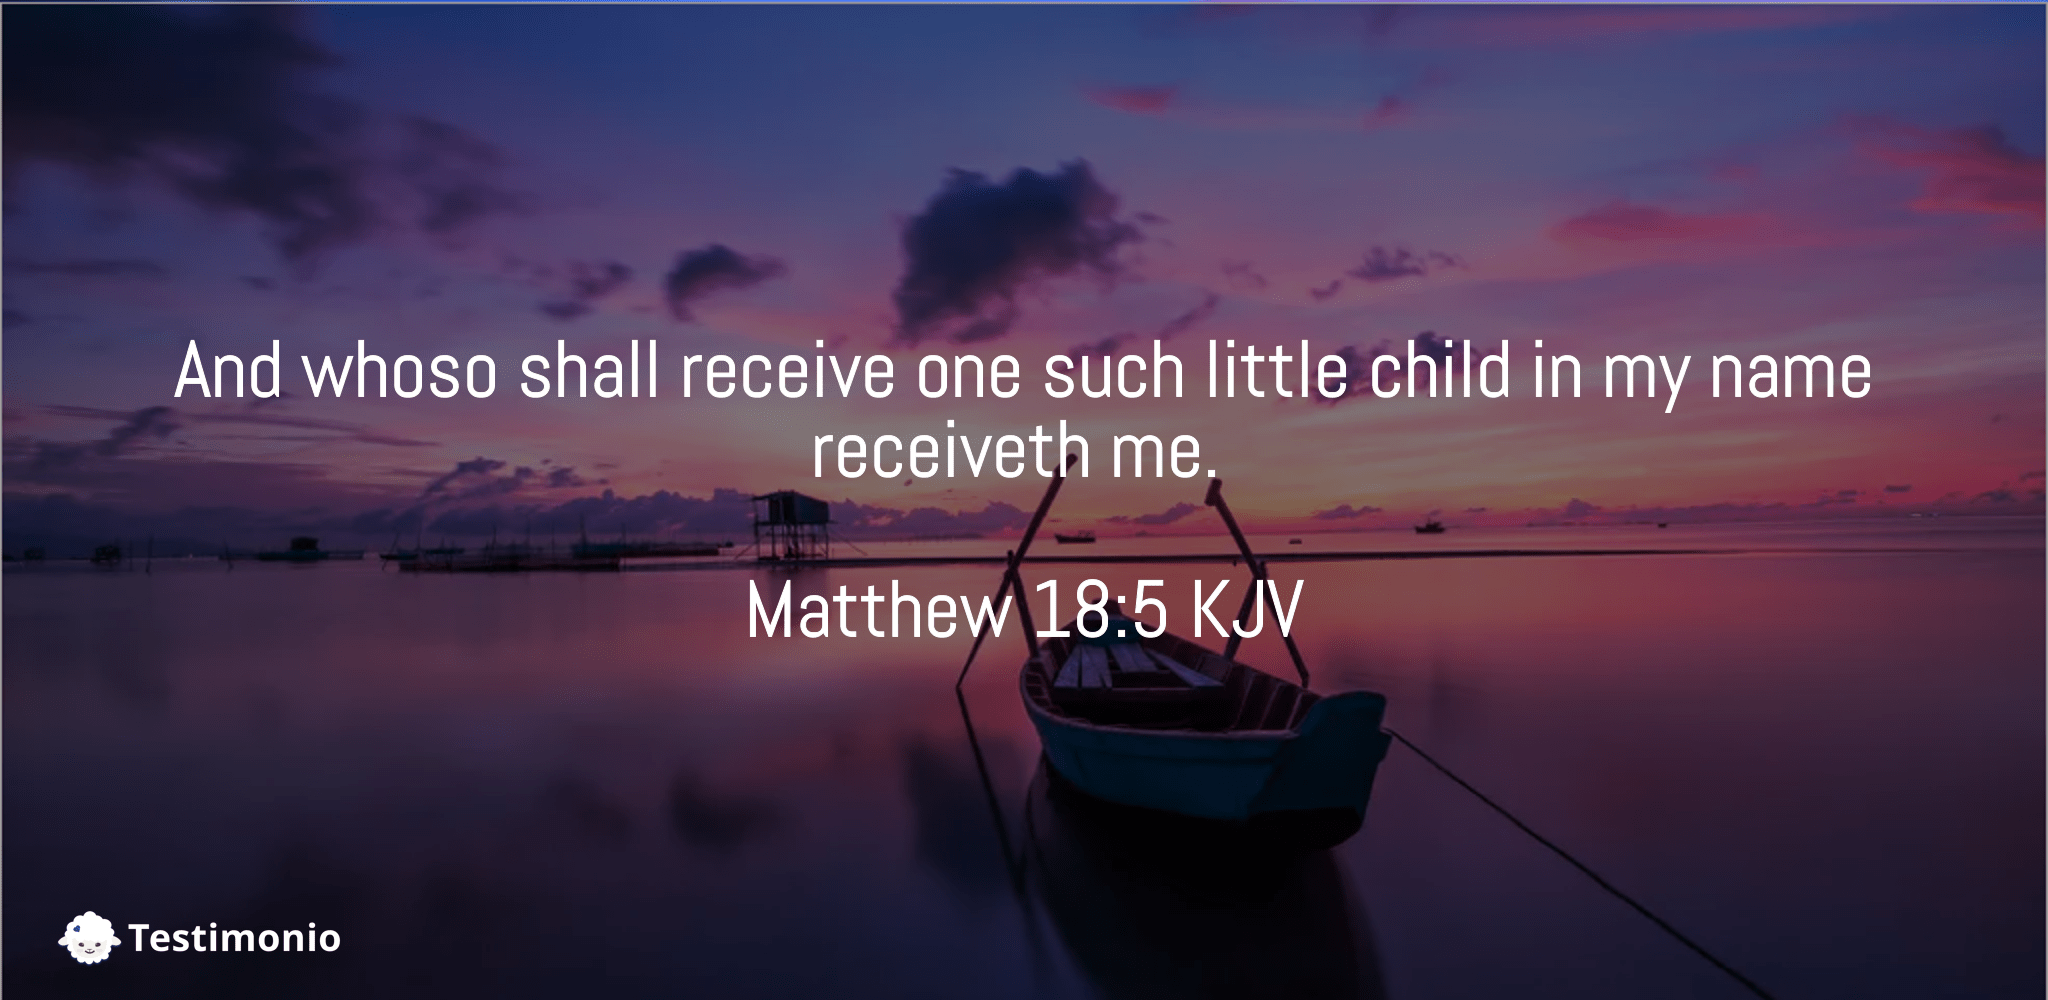 Matthew 18:5